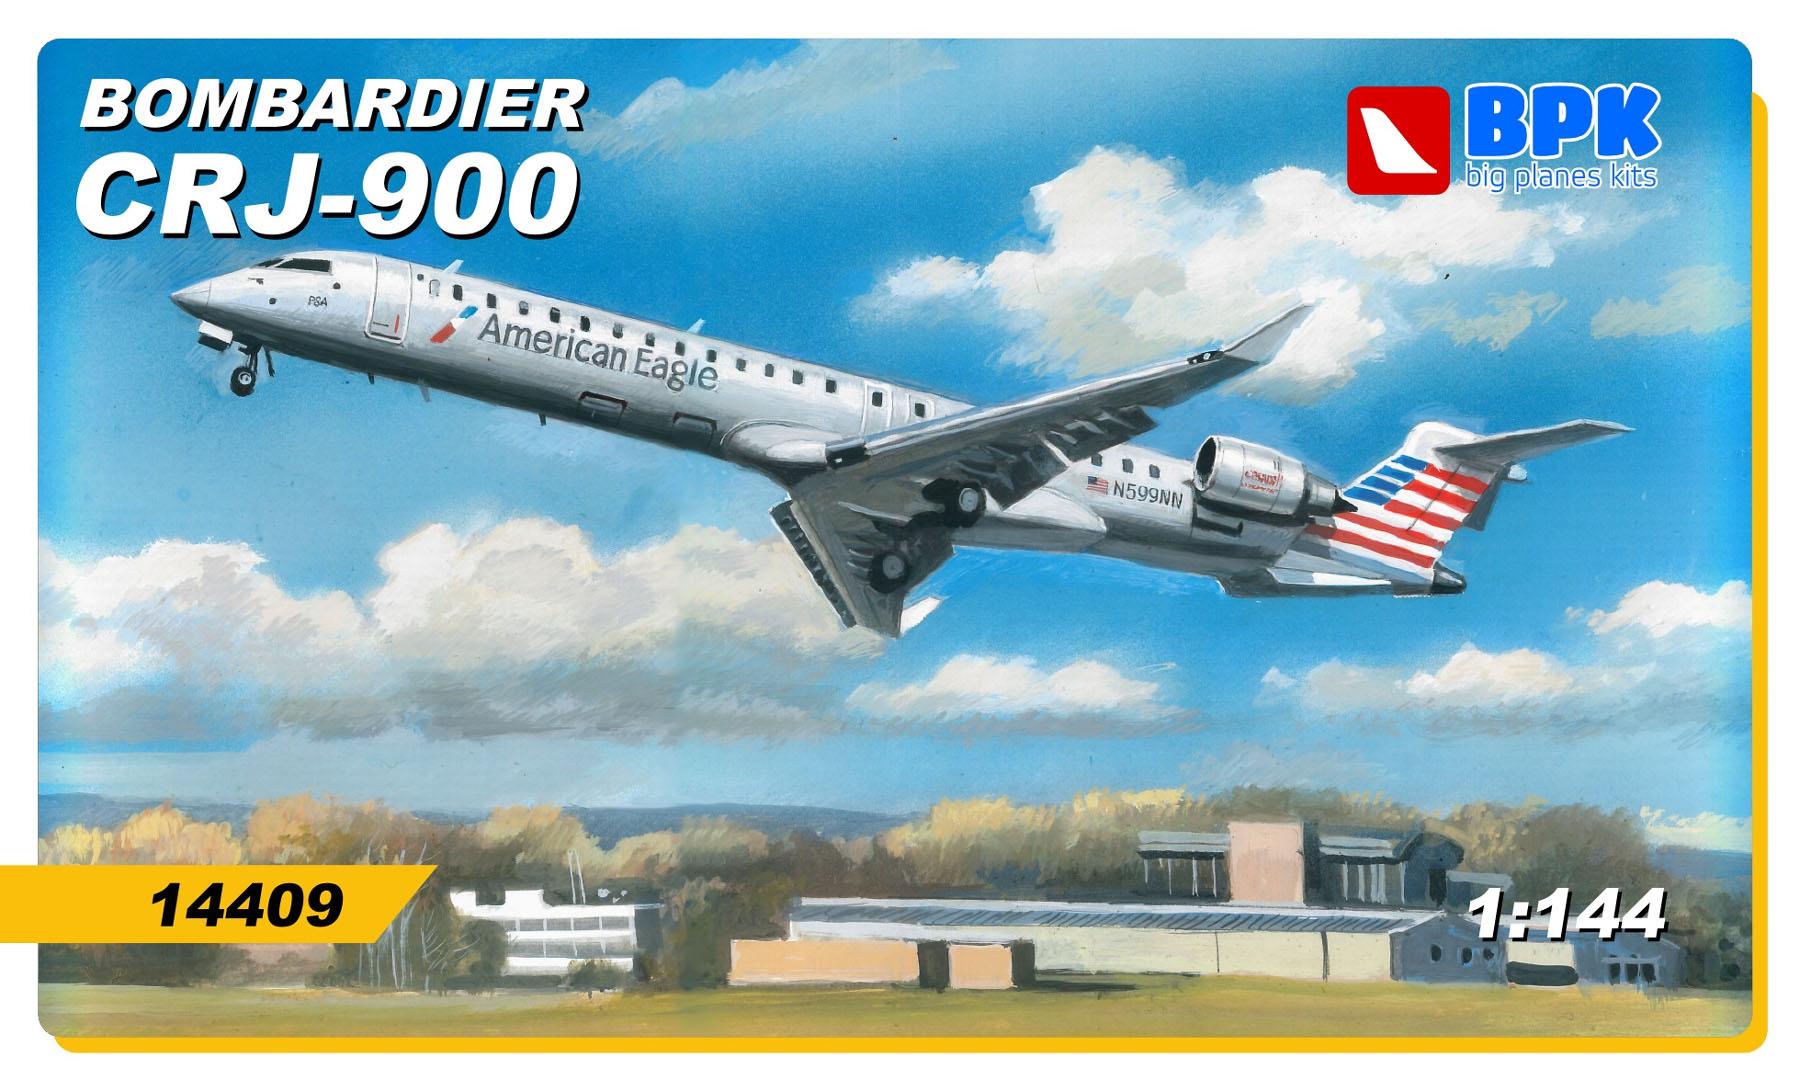 Bombardier CRJ-900 - 1/144 - BPK 14409  - BLIMPS COMÉRCIO ELETRÔNICO